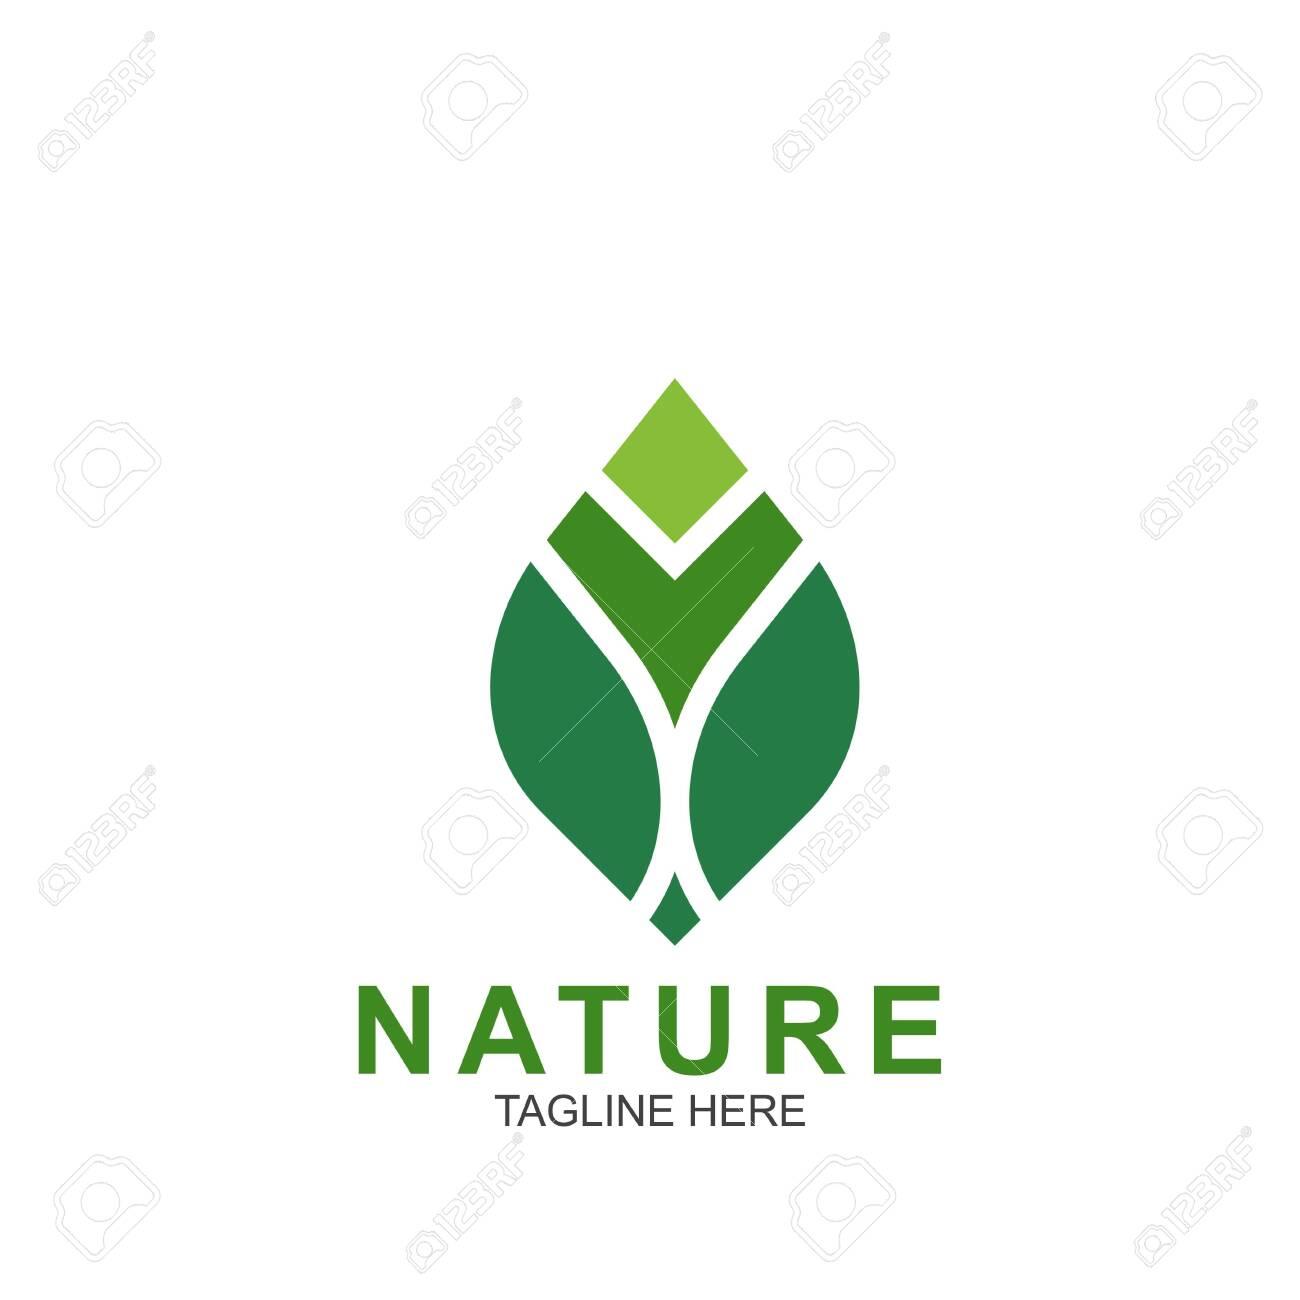 Leaf design logo Template. Green Nature Icon Design - 146554338